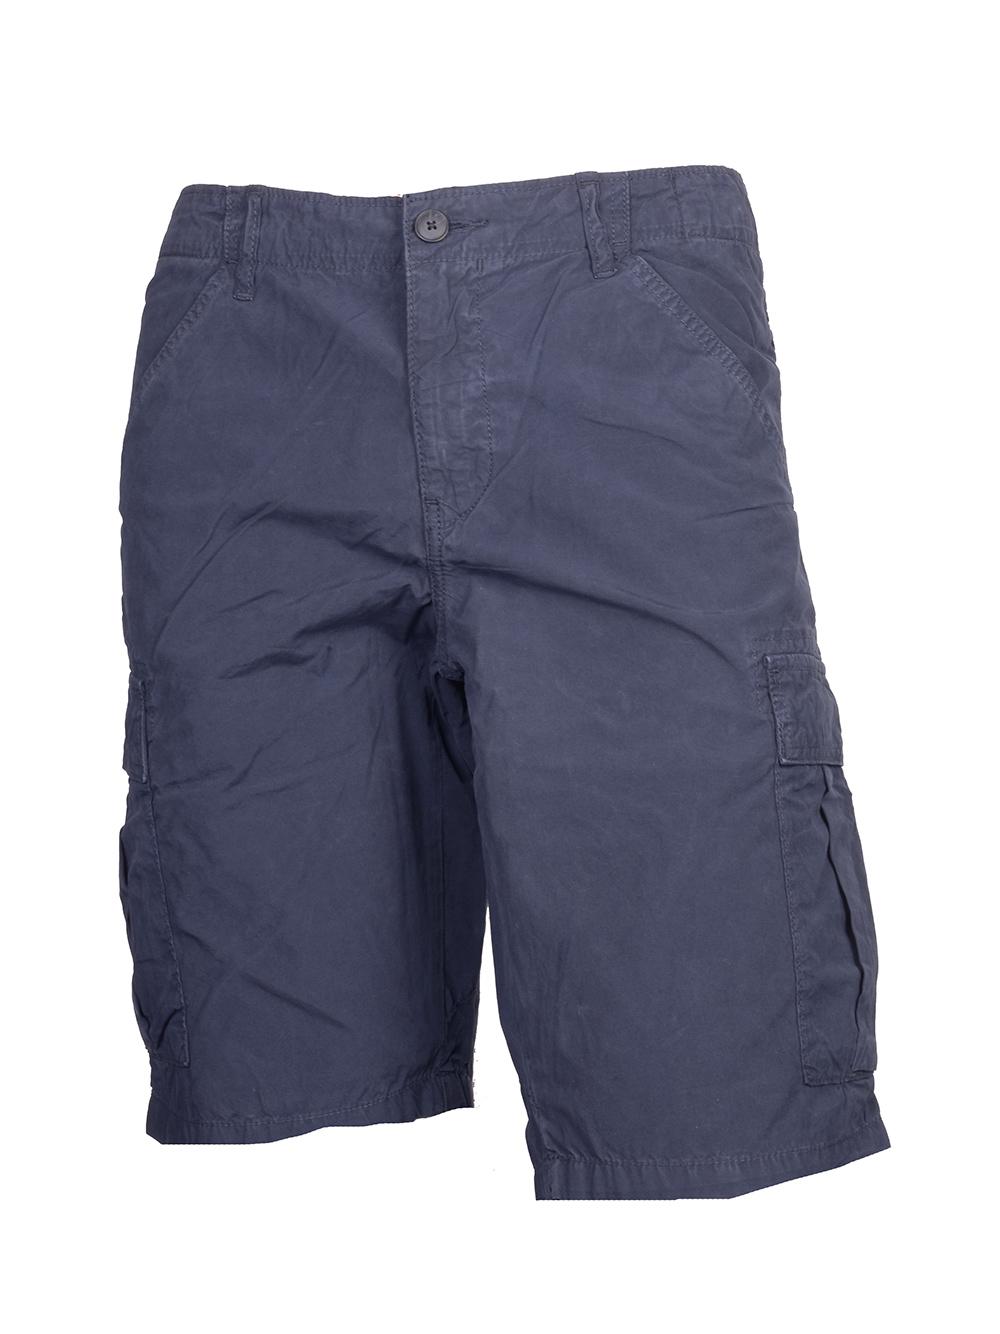 BOSS ORANGE Βερμούδα cargo Shorts d 82625 ΜΠΛΕ